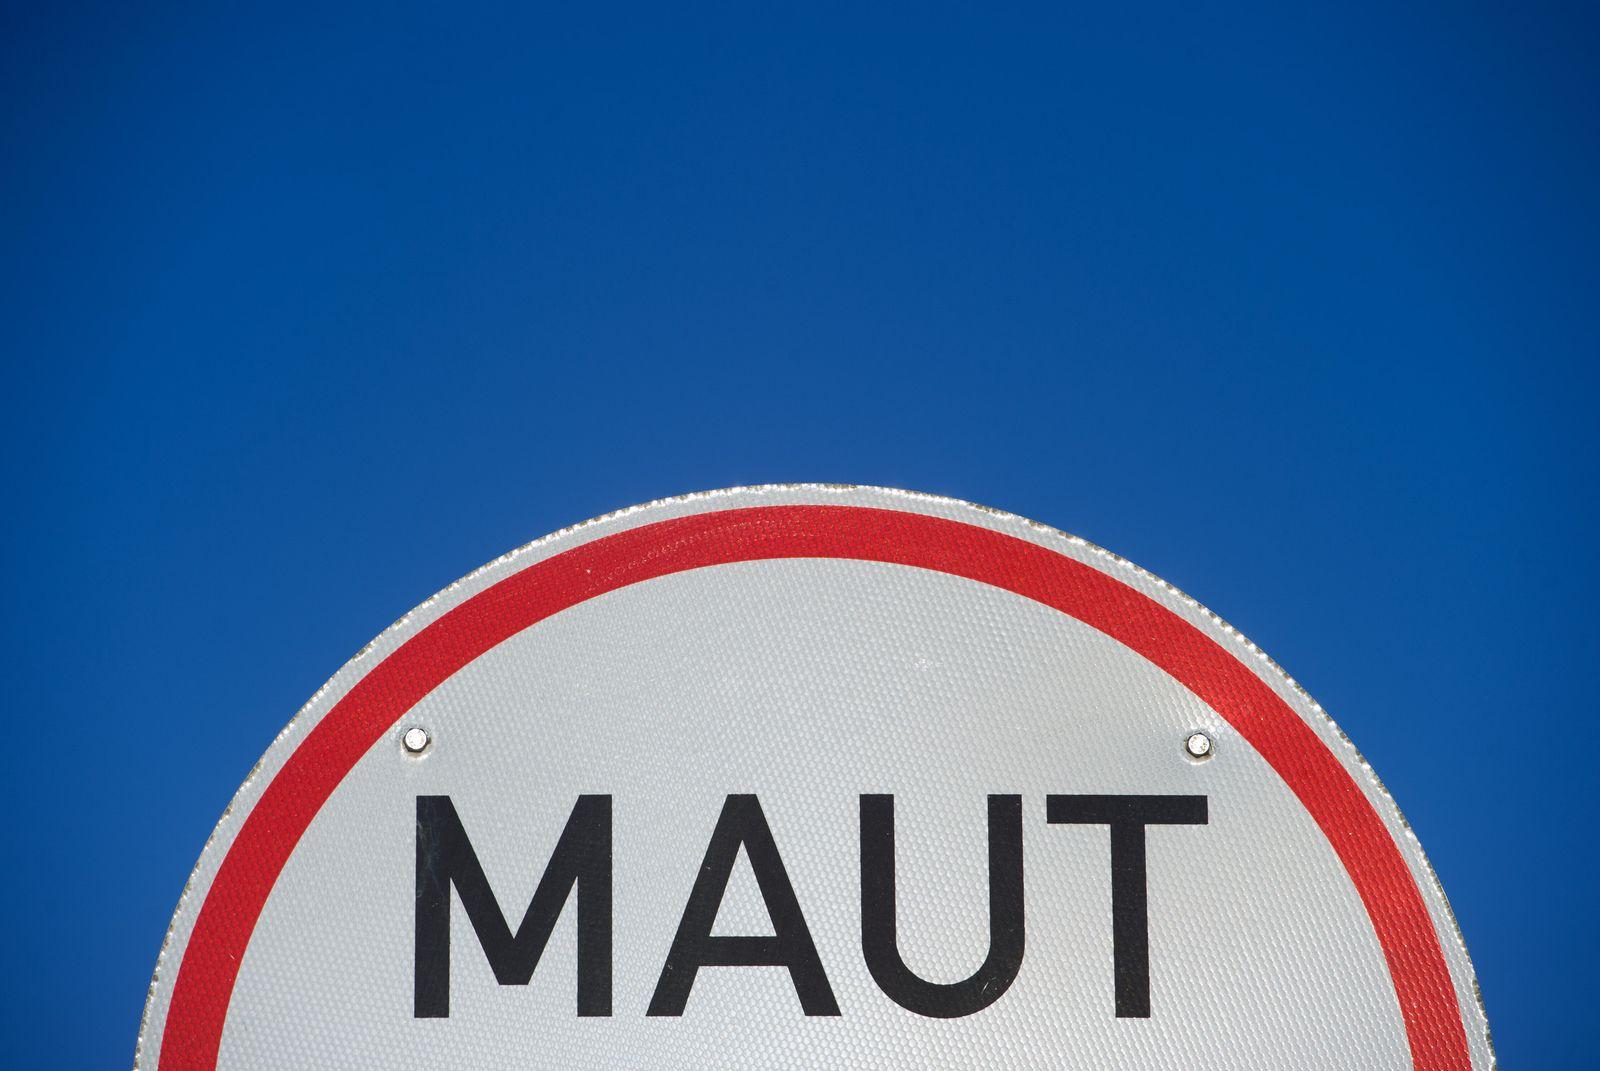 Maut / Symbol